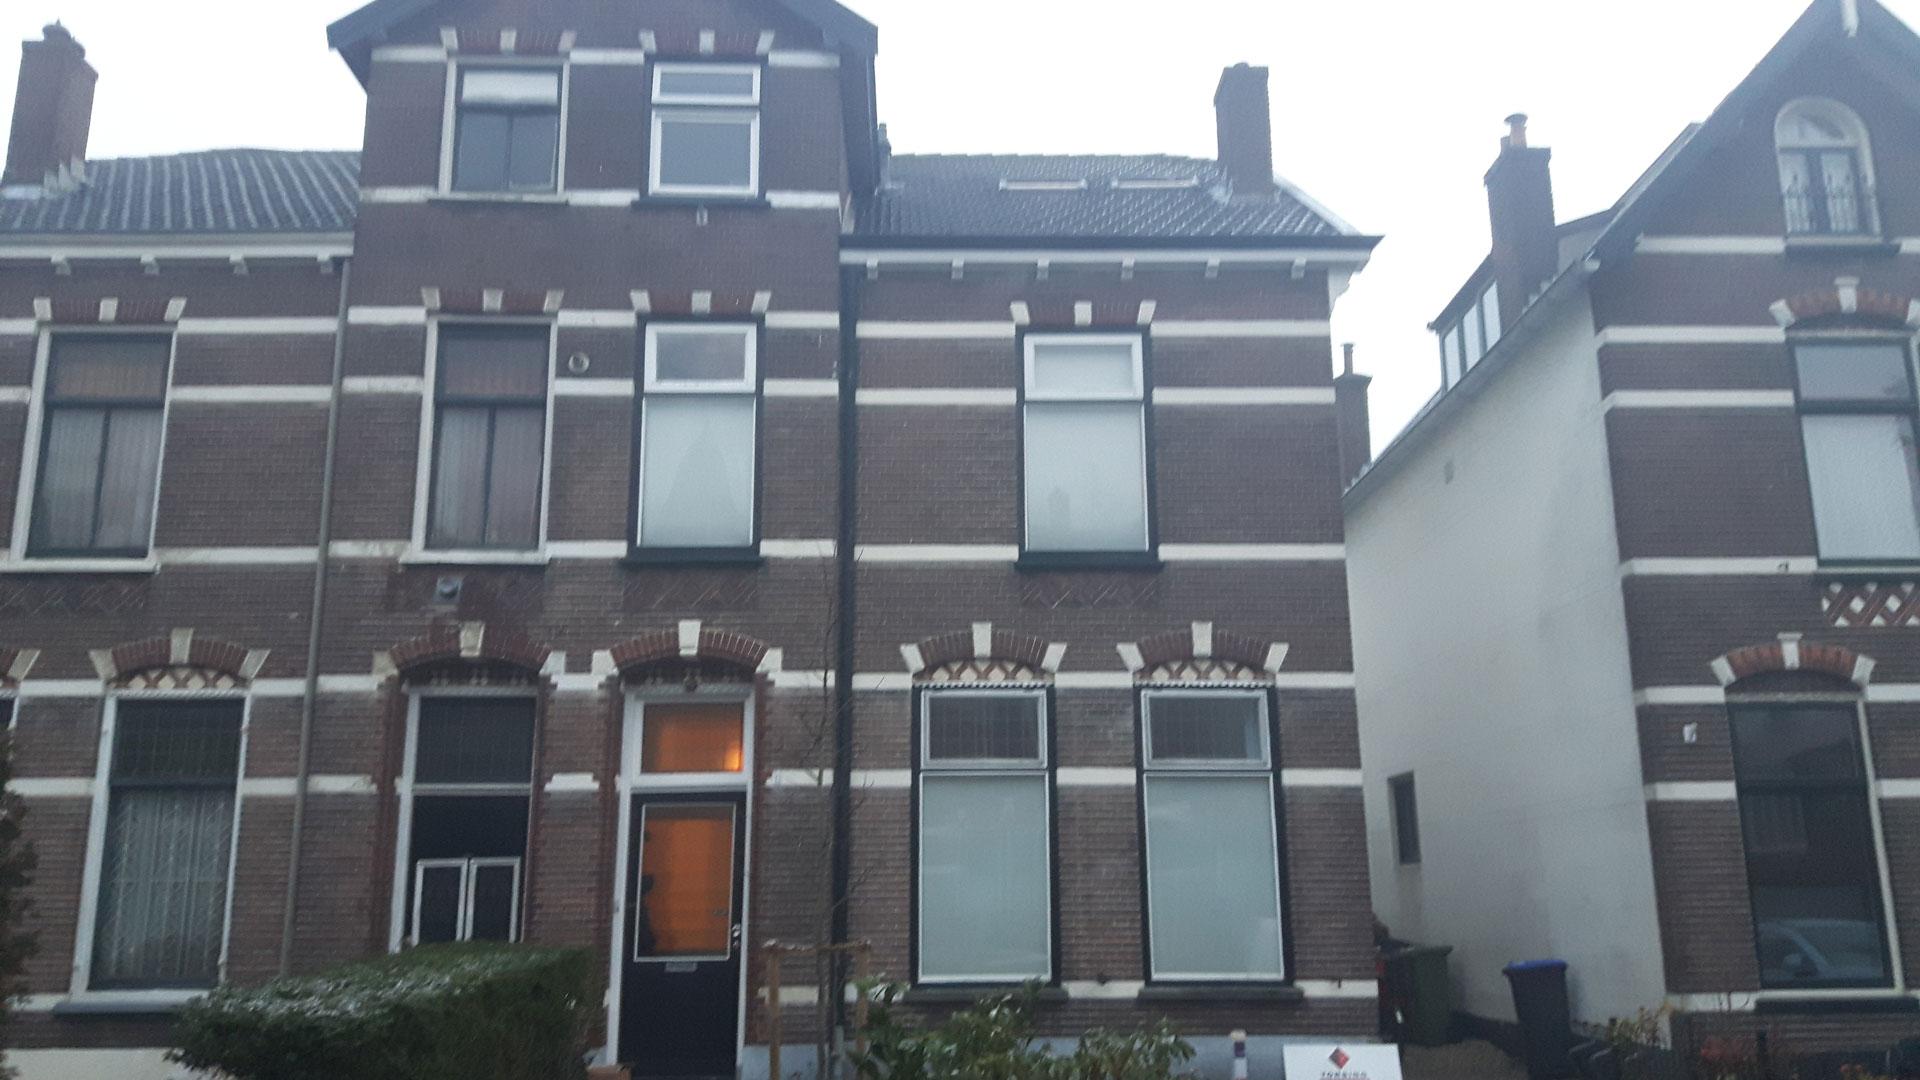 Mauritslaan in Hilversum